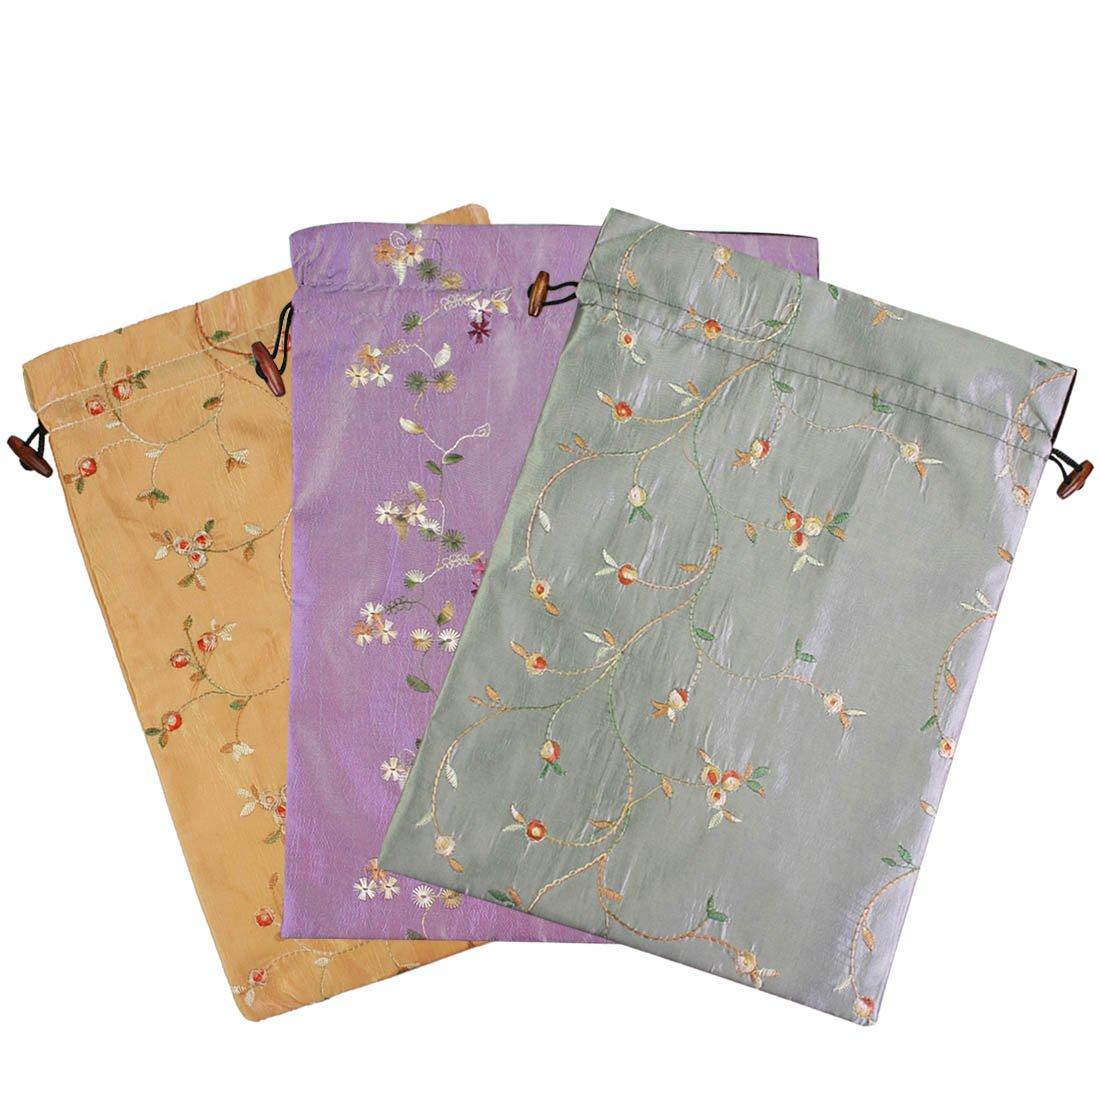 Lingerie /& Shoes Value Set of 3 kilofly Embroidered Silk Jacquard Travel Bag